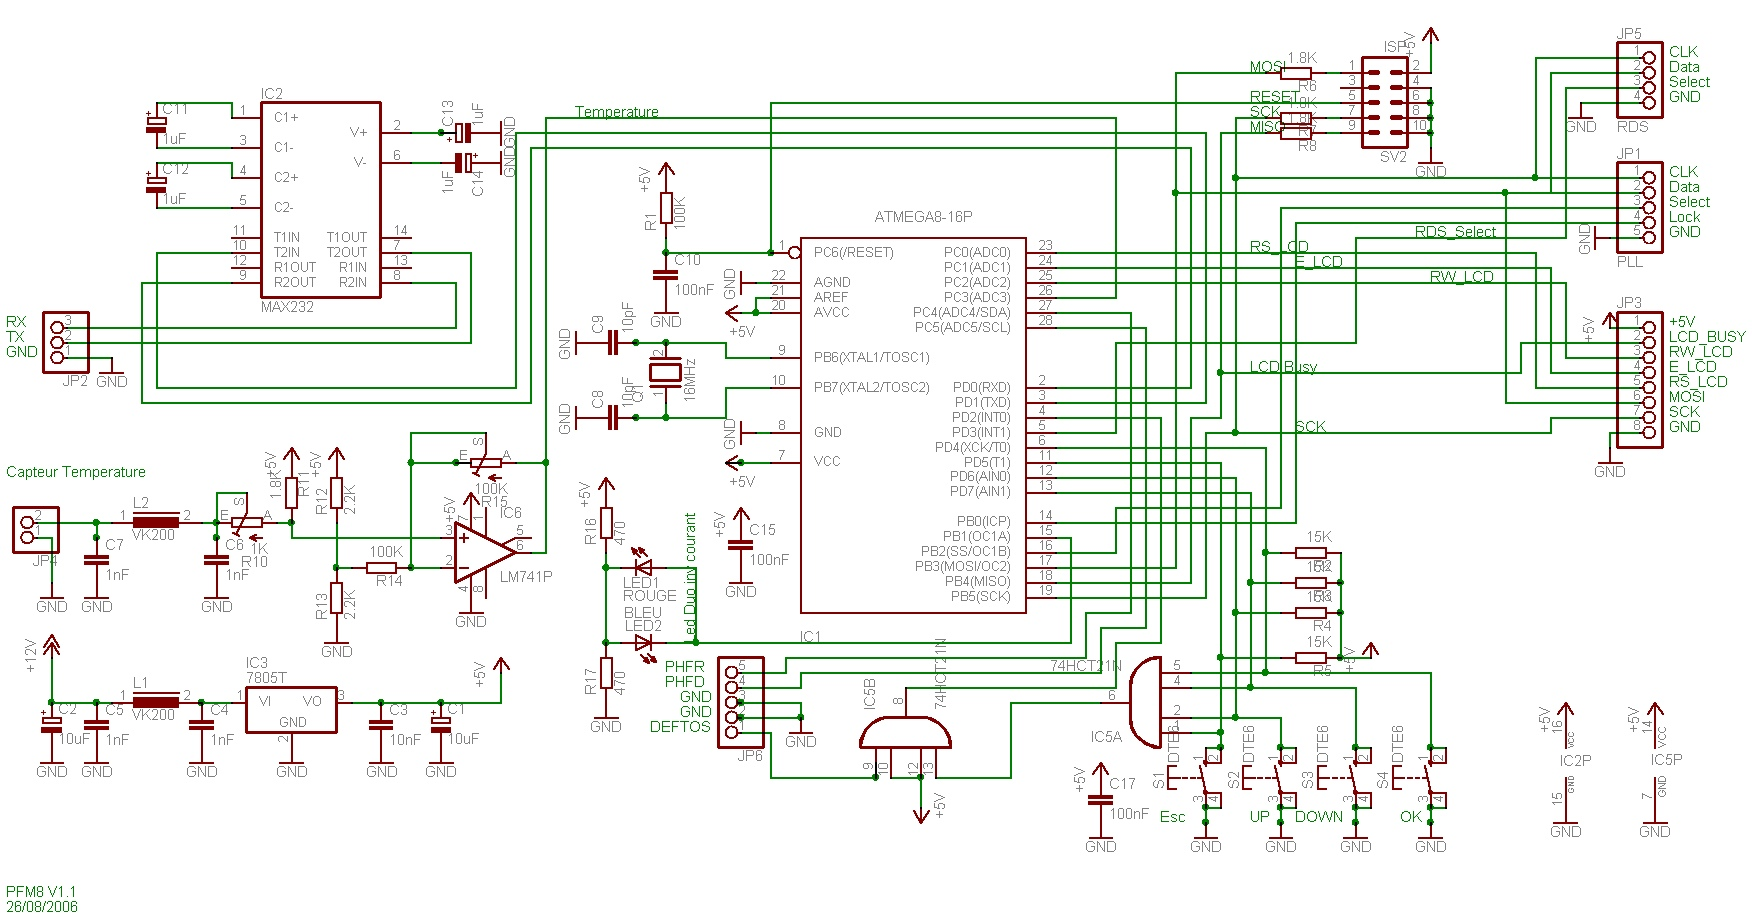 PFM8_schema µp avr atmega8 board for pll management